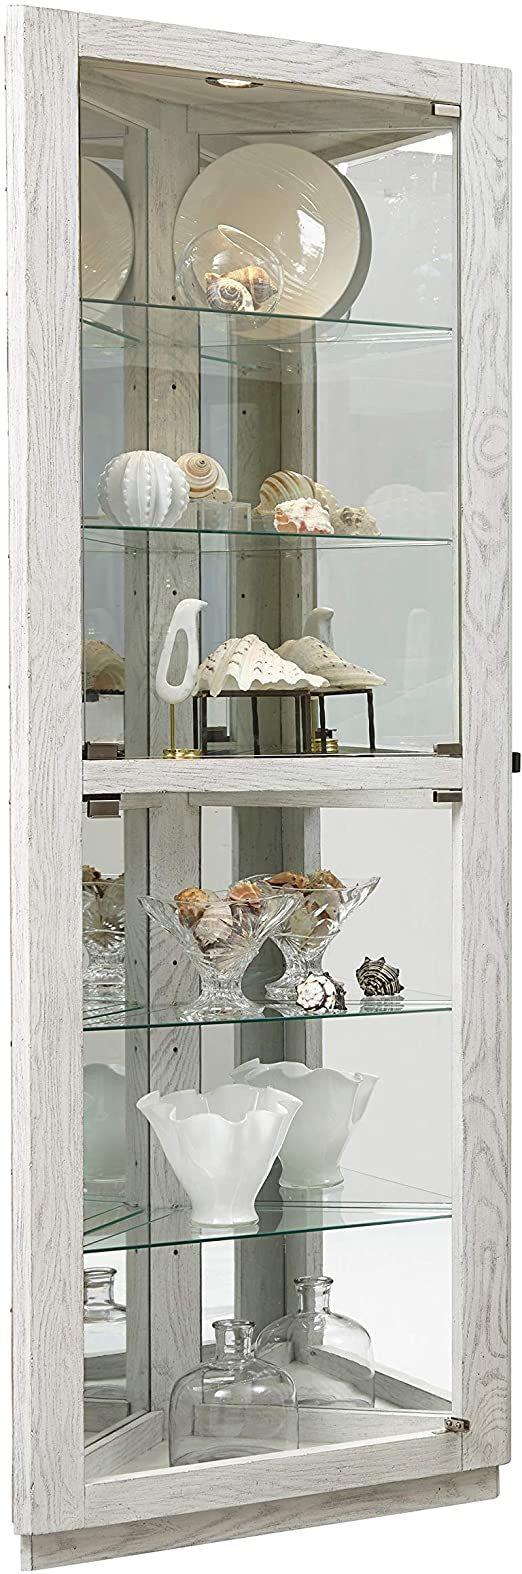 Antique White 5 Shelf Corner Cabinet Clear Grey Modern ... on Corner Sconce Shelf Cabinet id=50460